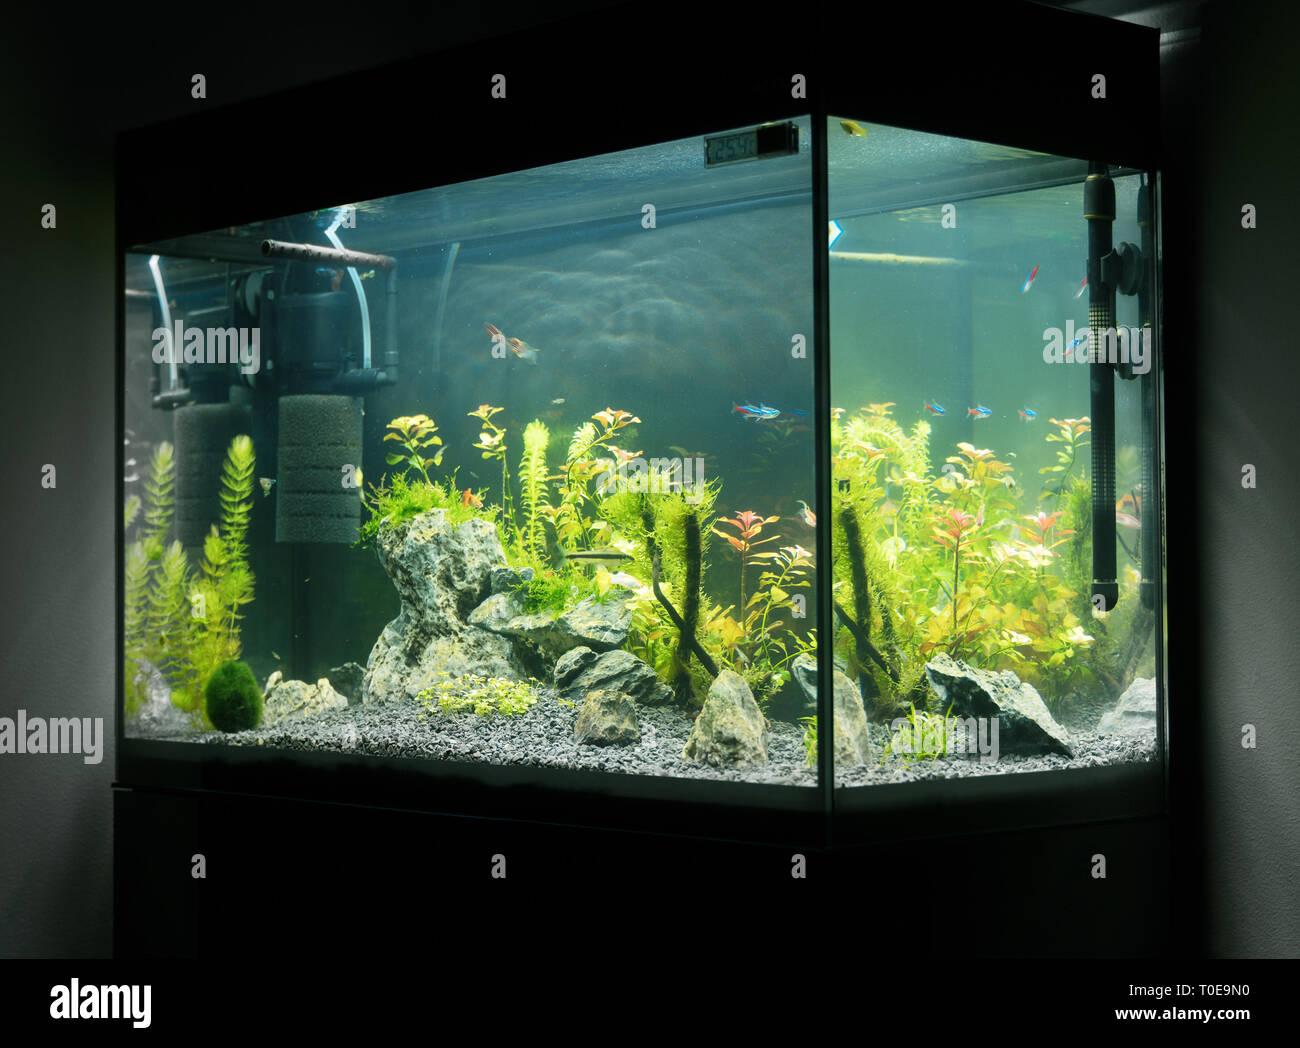 Beautiful Planted Tropical Freshwater Aquarium With Fishes Aquascape Stock Photo Alamy